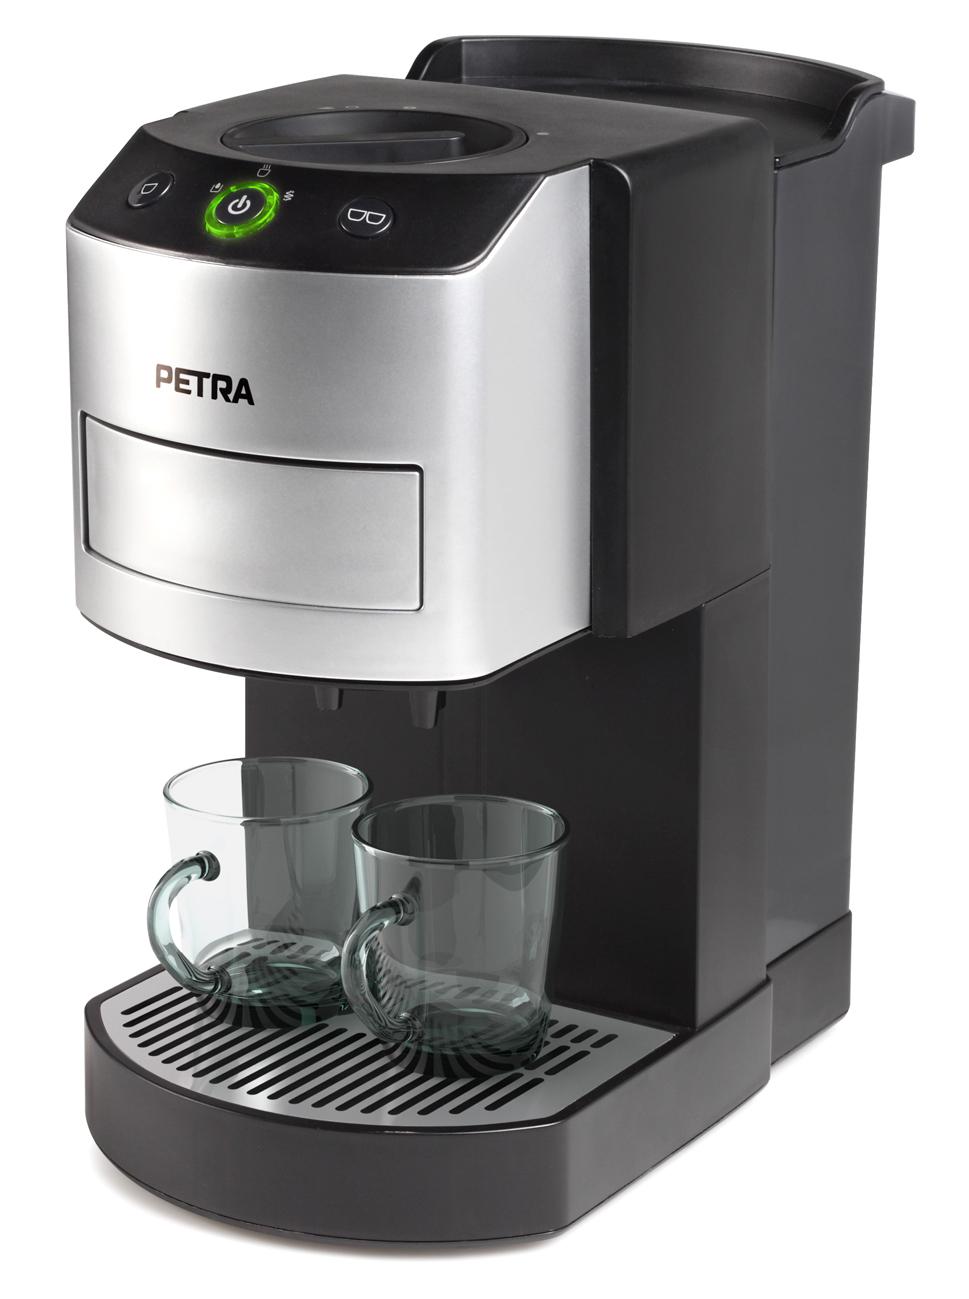 petra kaffee pad automat km bef llt zwei tassen gleichzeitig. Black Bedroom Furniture Sets. Home Design Ideas